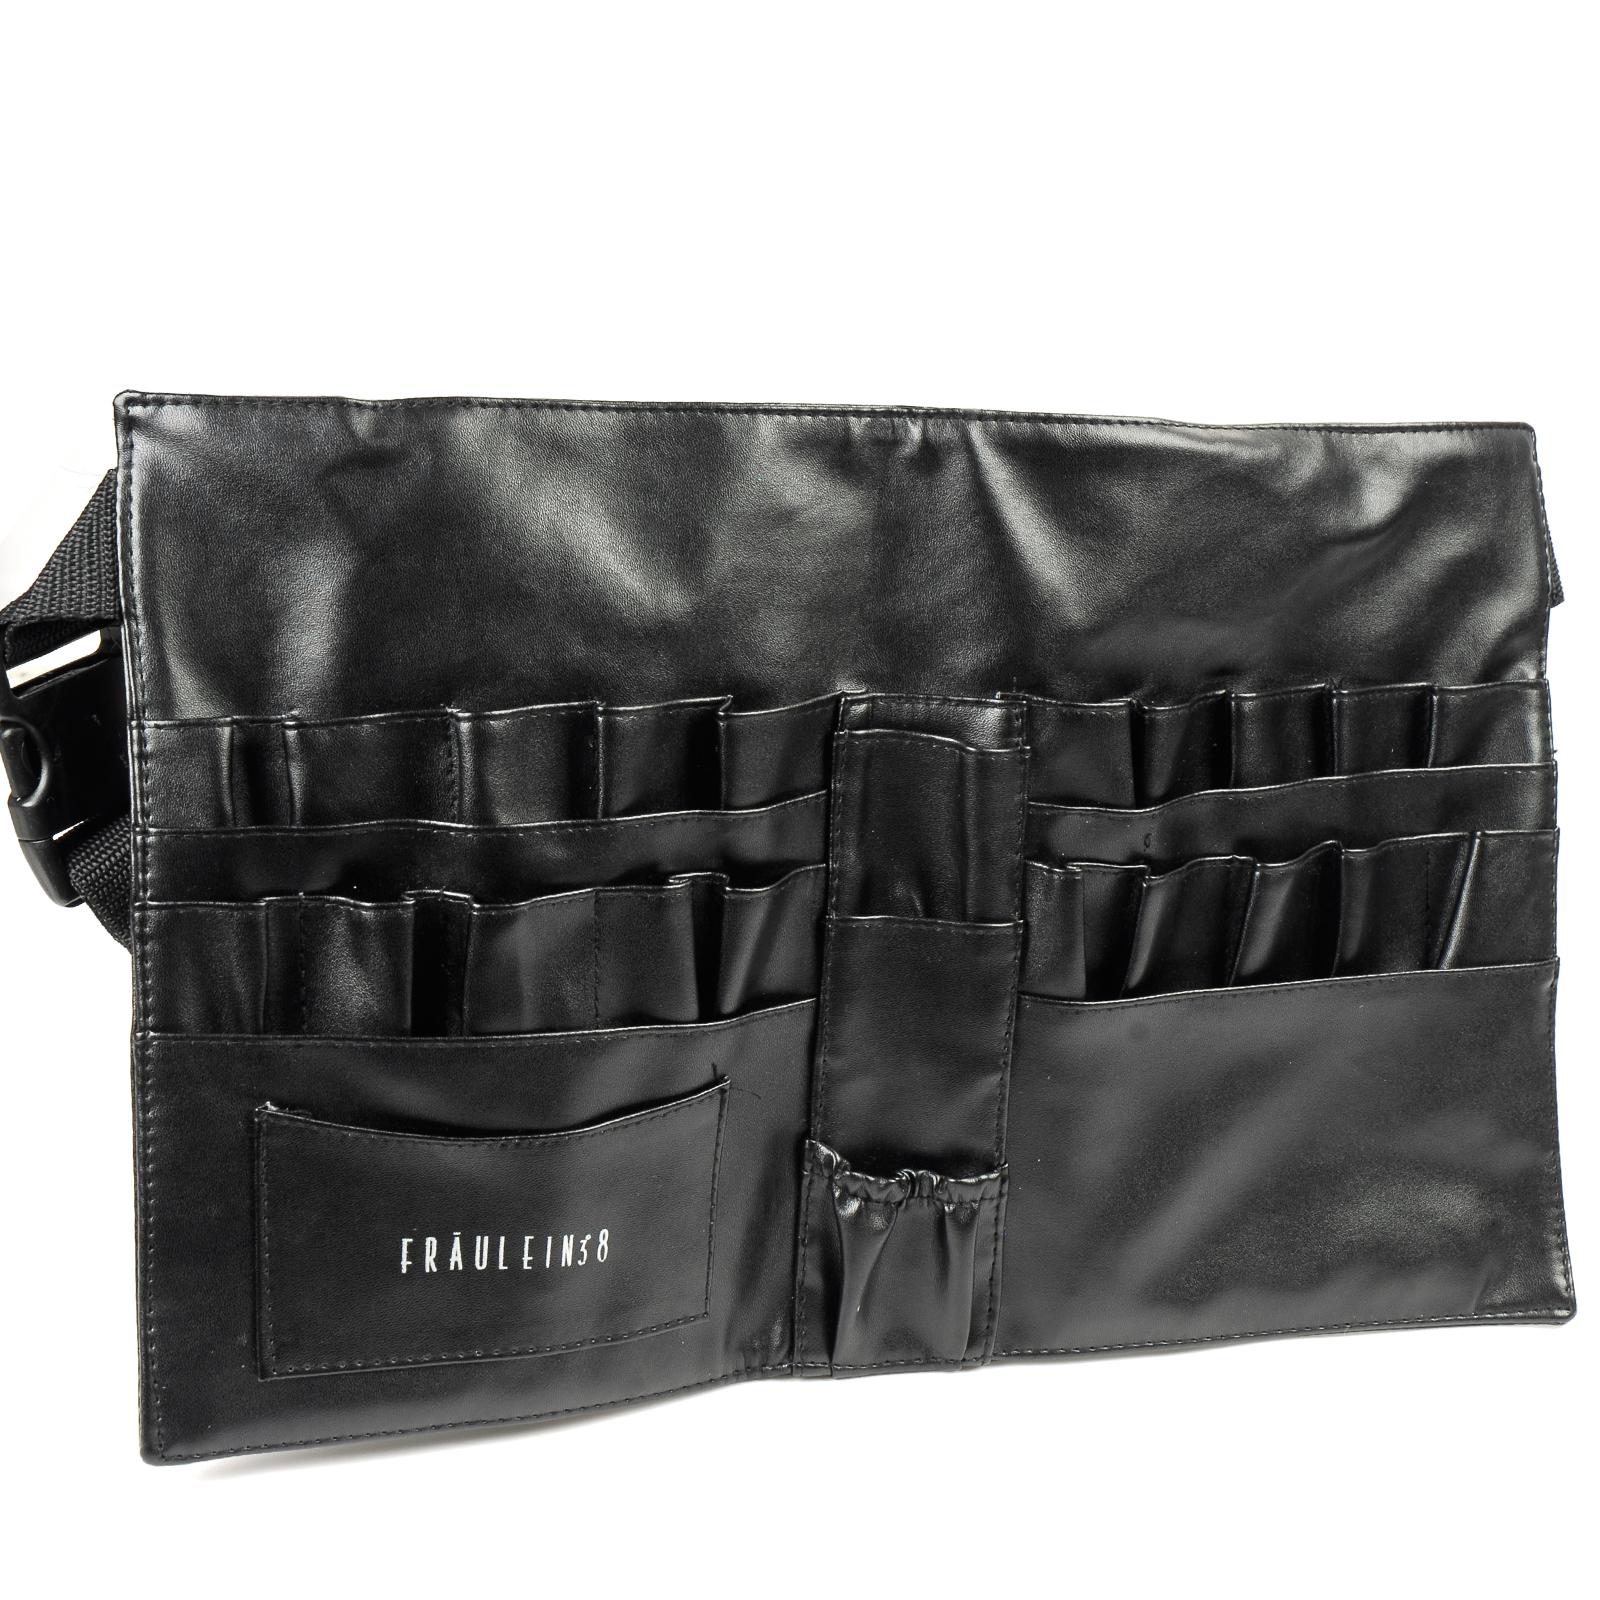 White half apron ebay - Fr Ulein 3 8 Make Up Brush Apron Toolbelt Tool Bag Belt